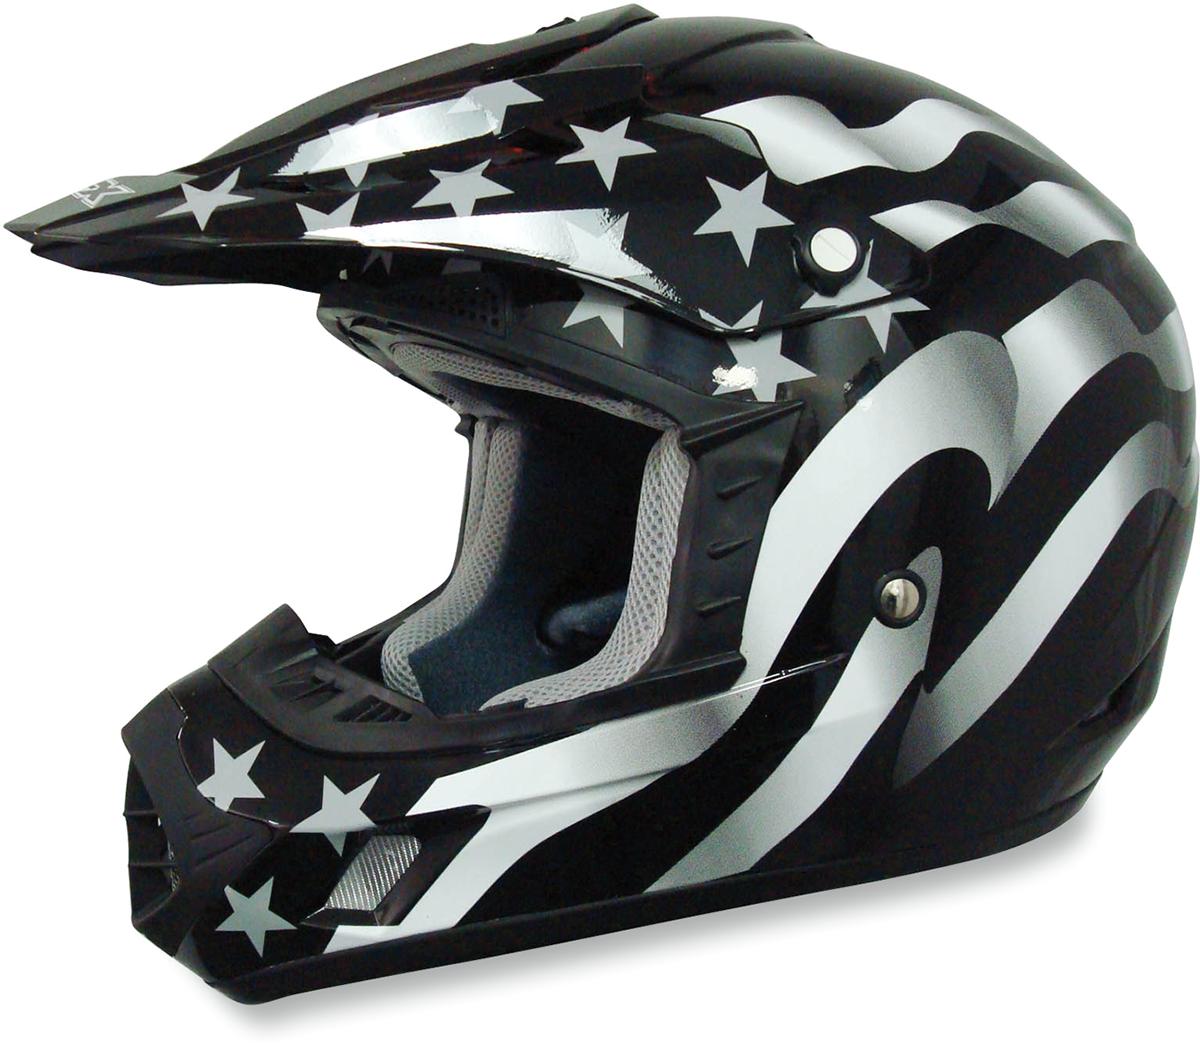 AFX FX17 Freedom Stealth Unisex Adult Offroad ATV UTV Riding Racing Helmet